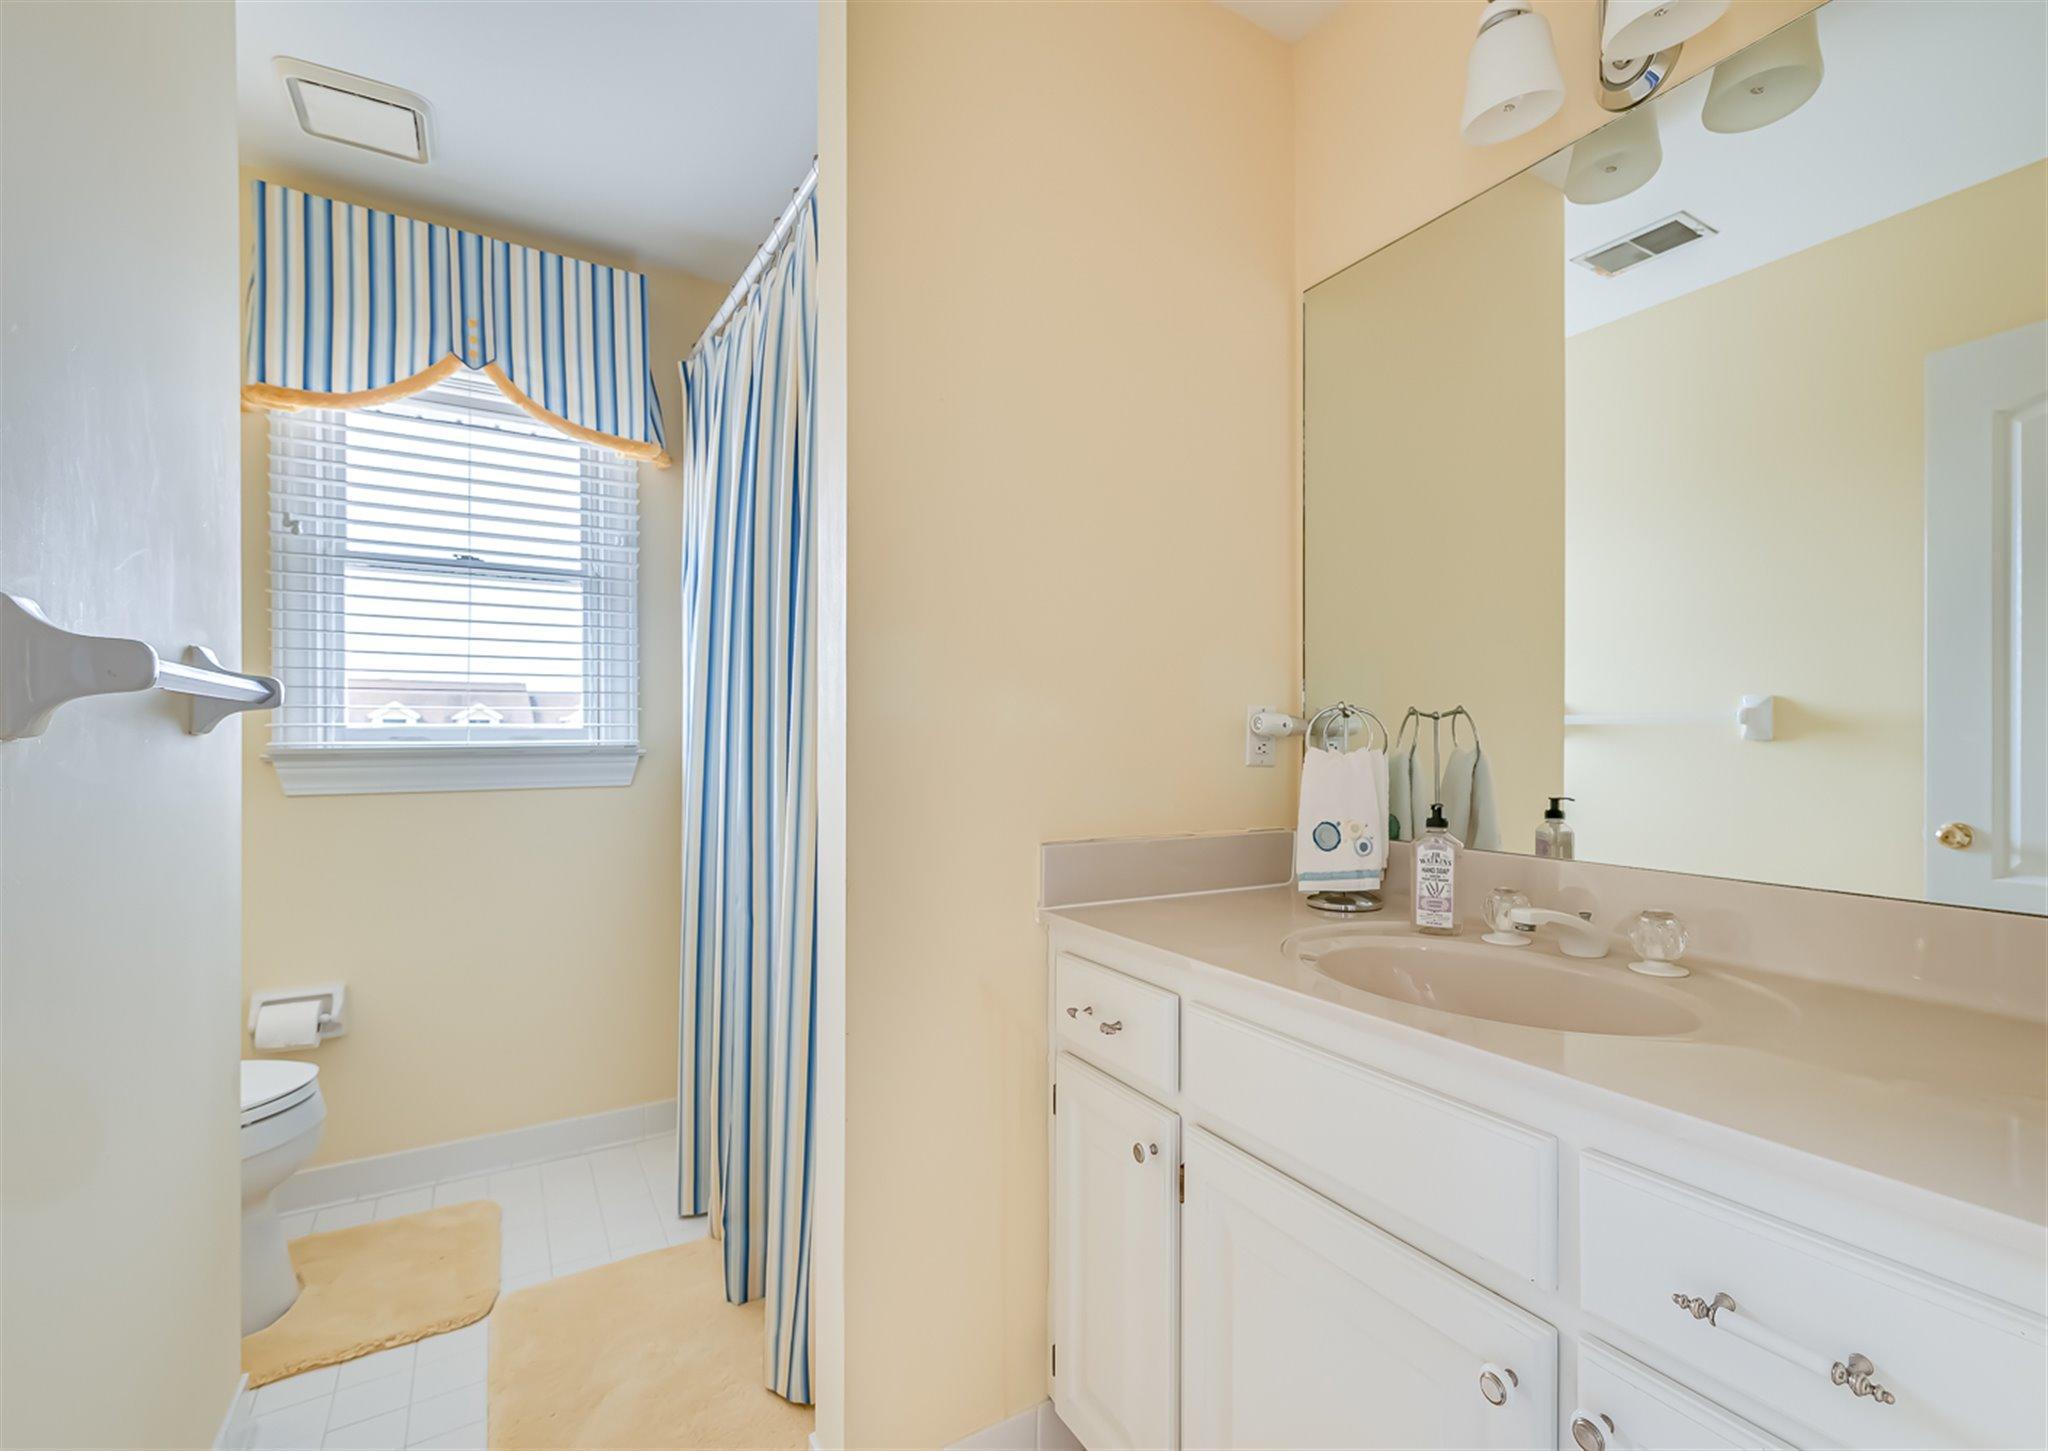 Indigo Point Homes For Sale - 50 Indigo Point, Charleston, SC - 11